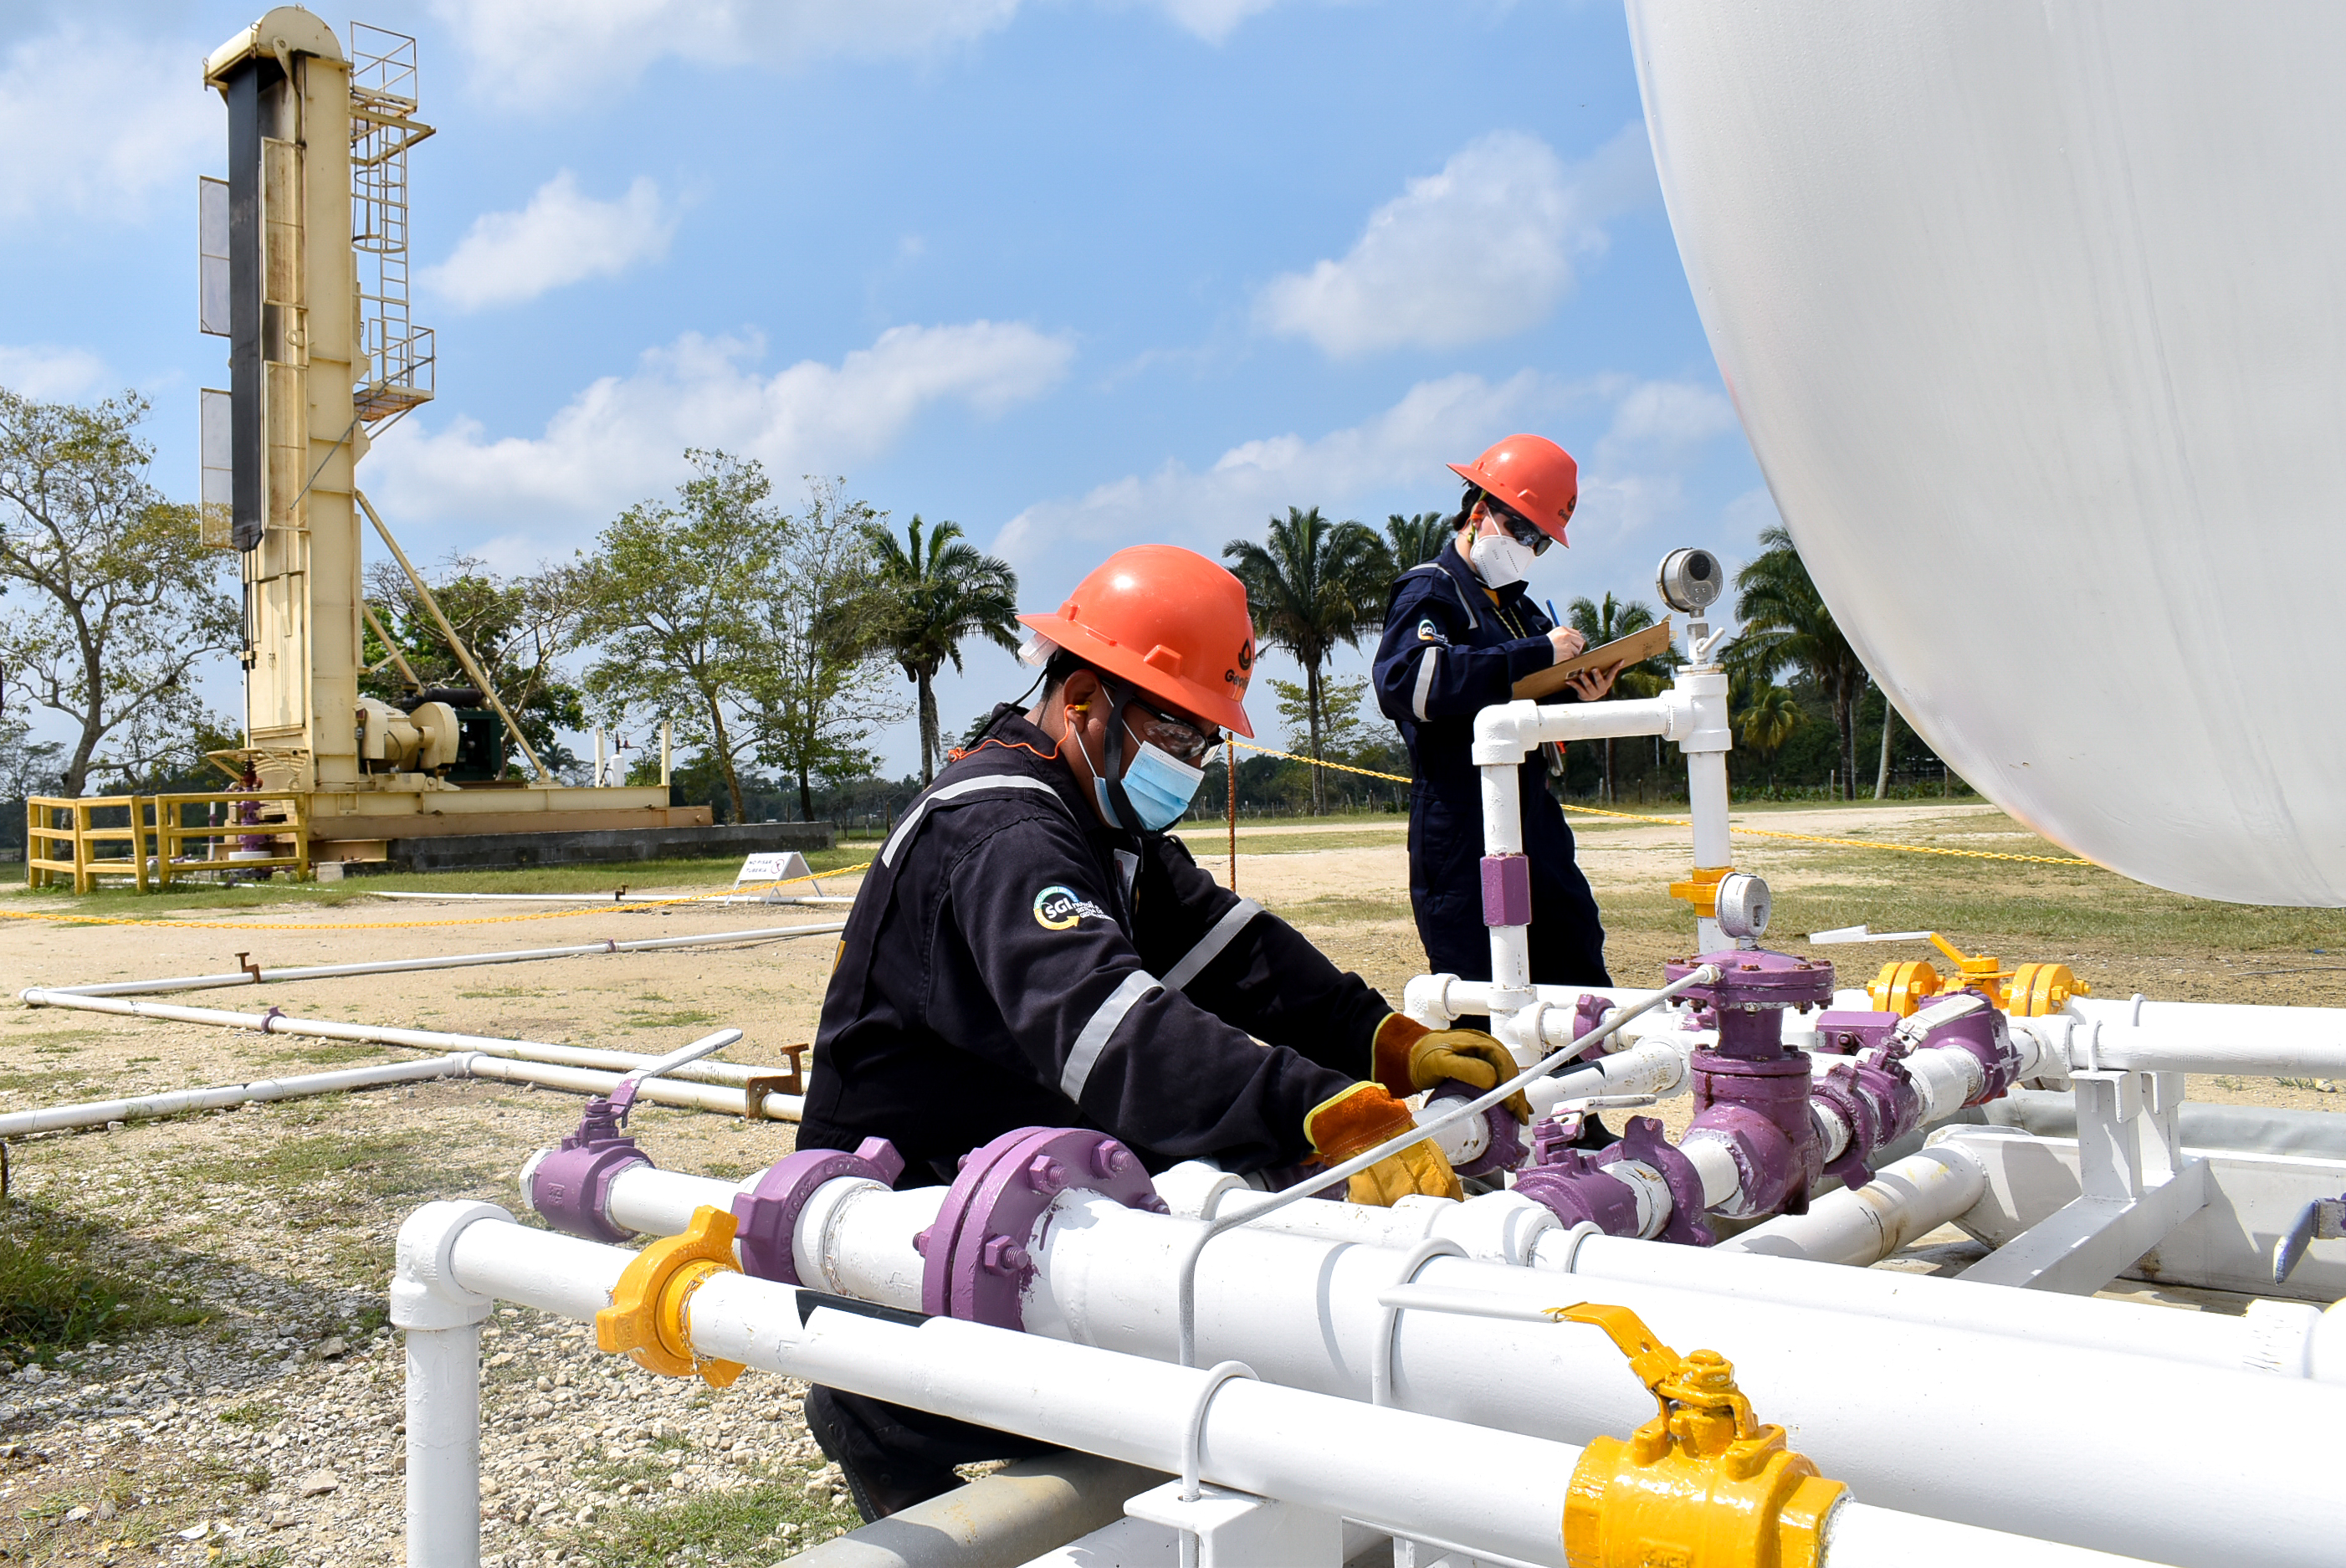 Geolis apertura sucursal de operaciones en Colombia, e imparte primer curso de Jet Pump.